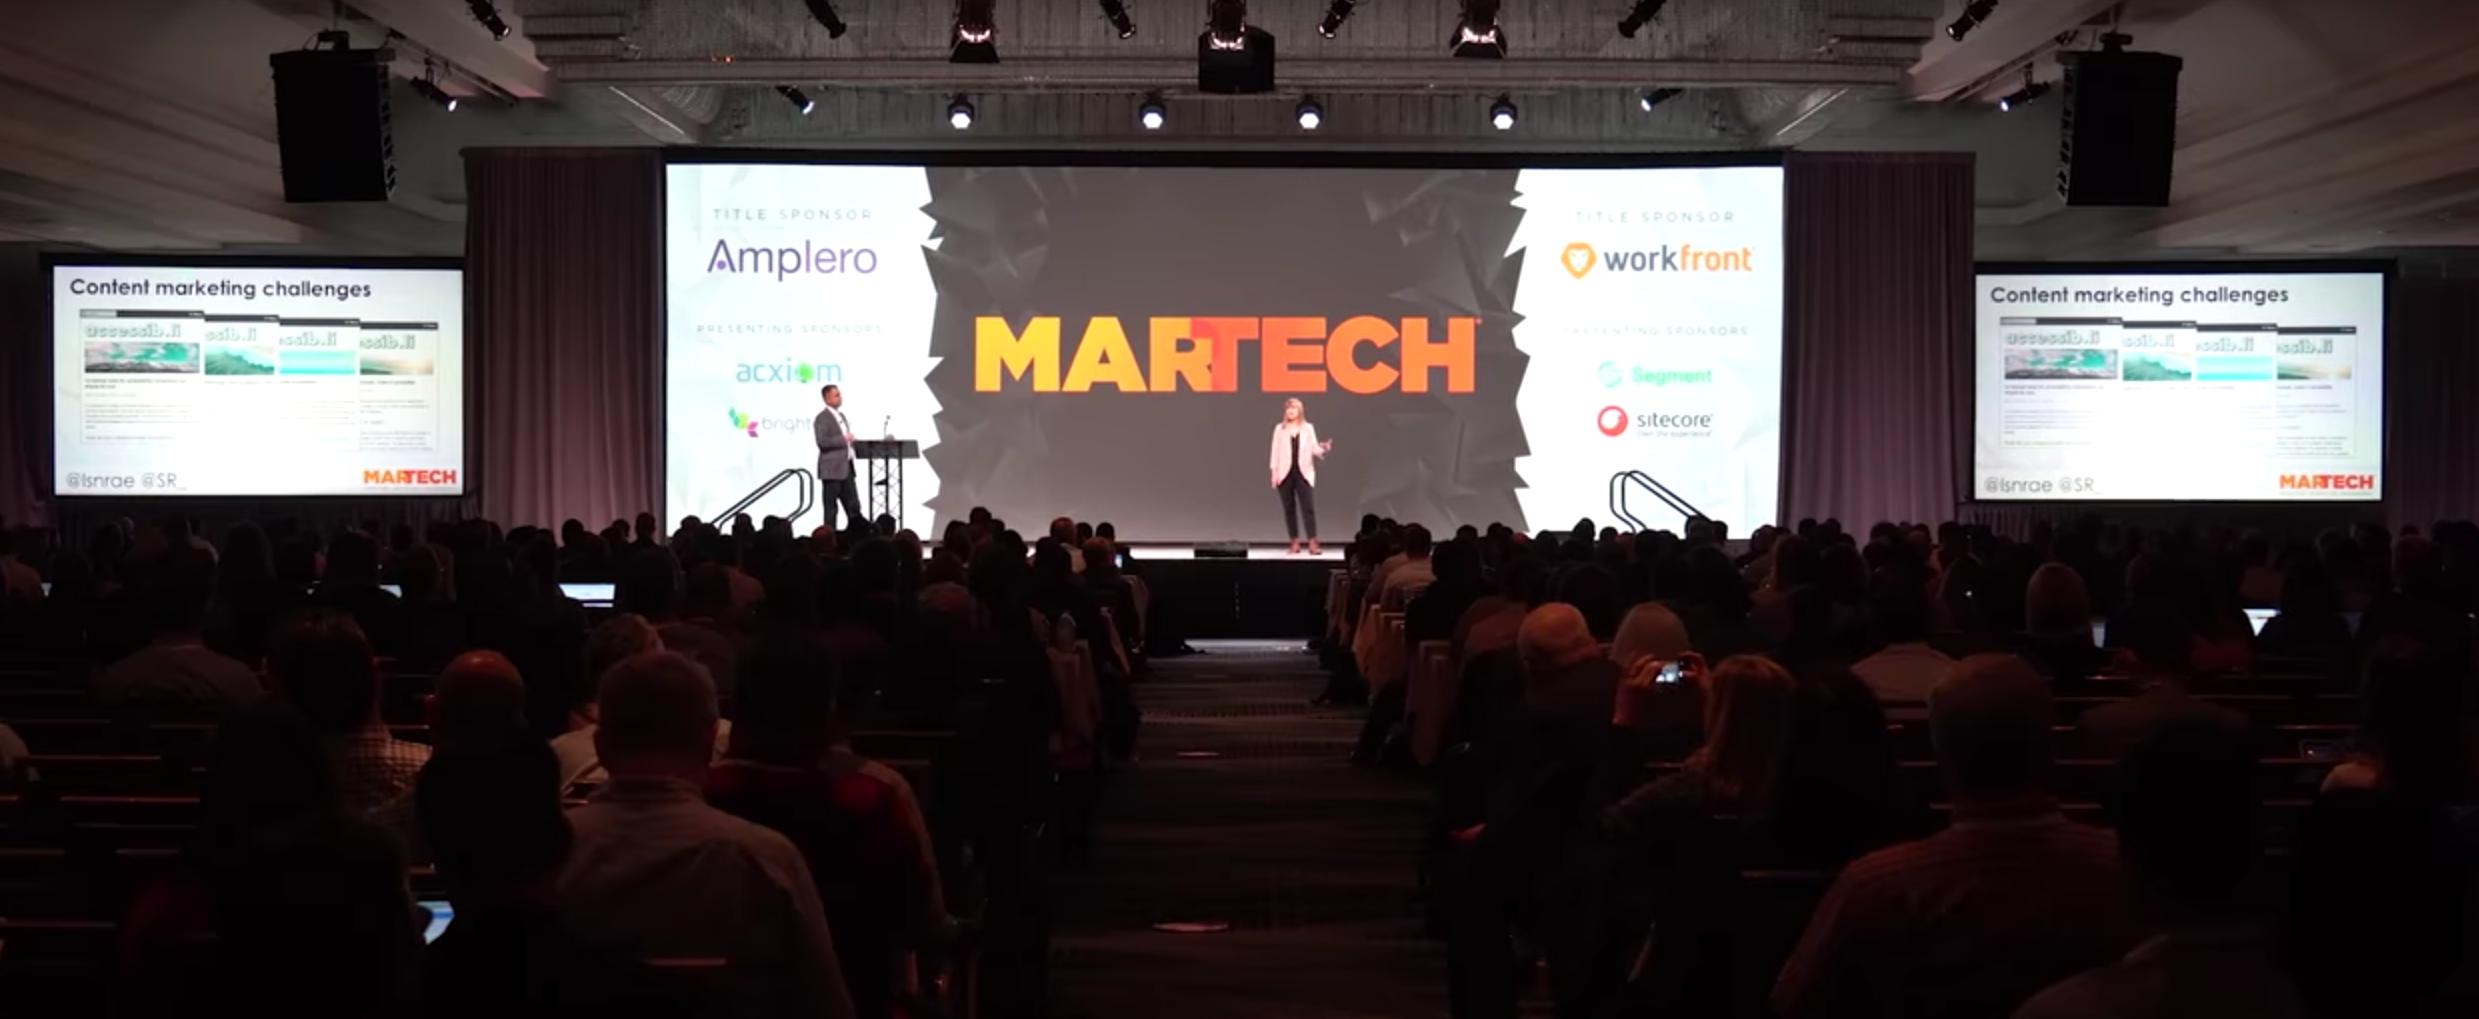 MarTech 2018 Marketing Conferences